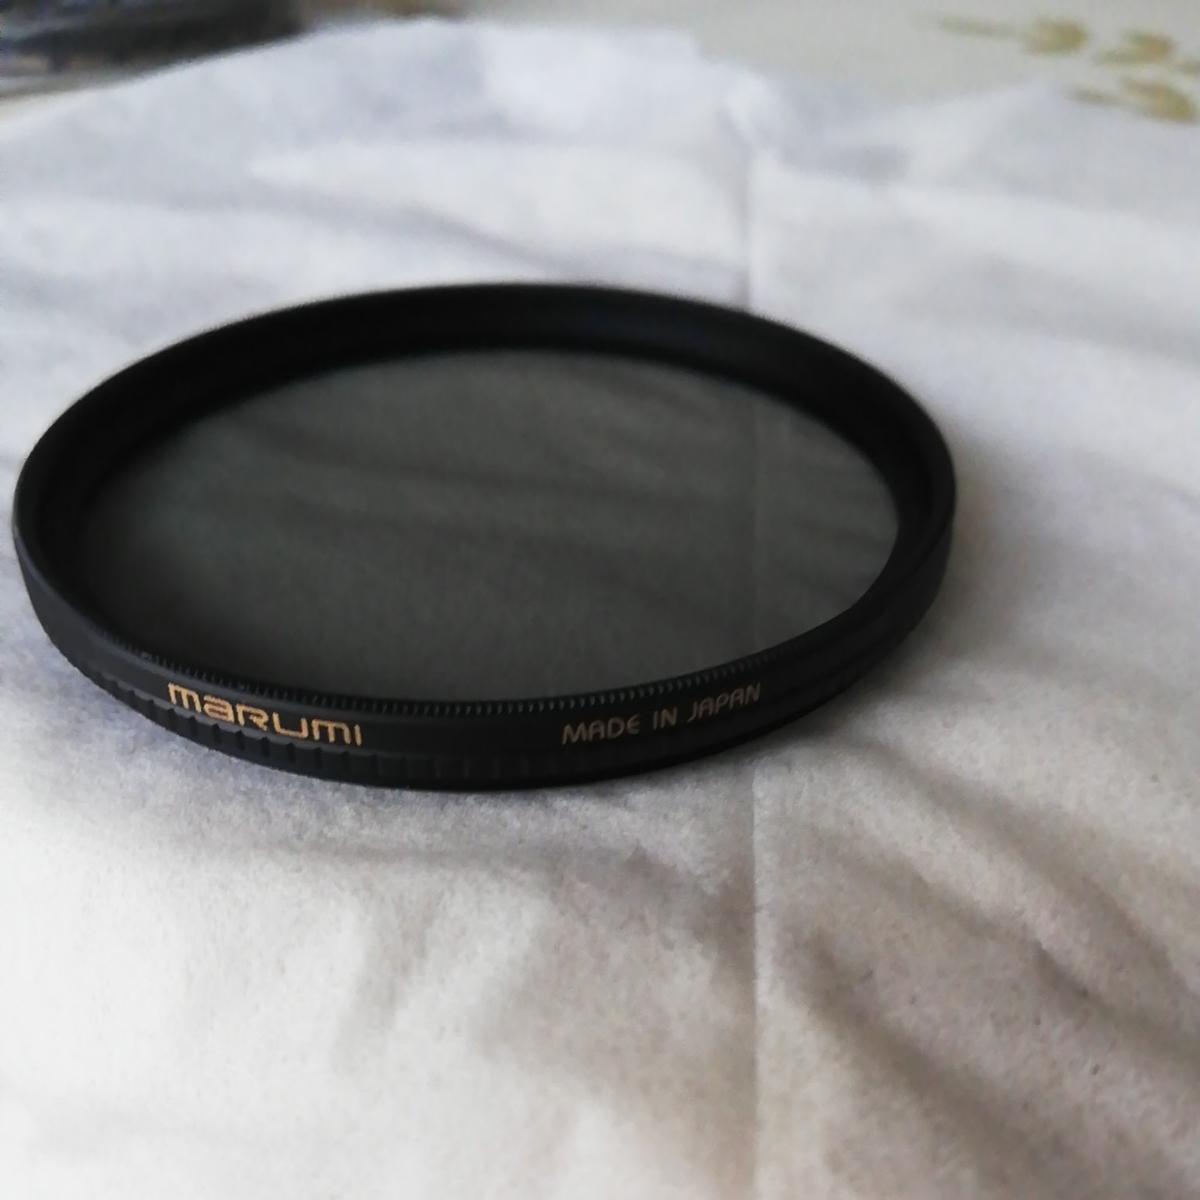 MARUMI EXUS 58mm C-PL サーキュラーPL 円偏光 超薄枠 撥水防汚 帯電防止 マルミ 2019年1月購入品 _画像2